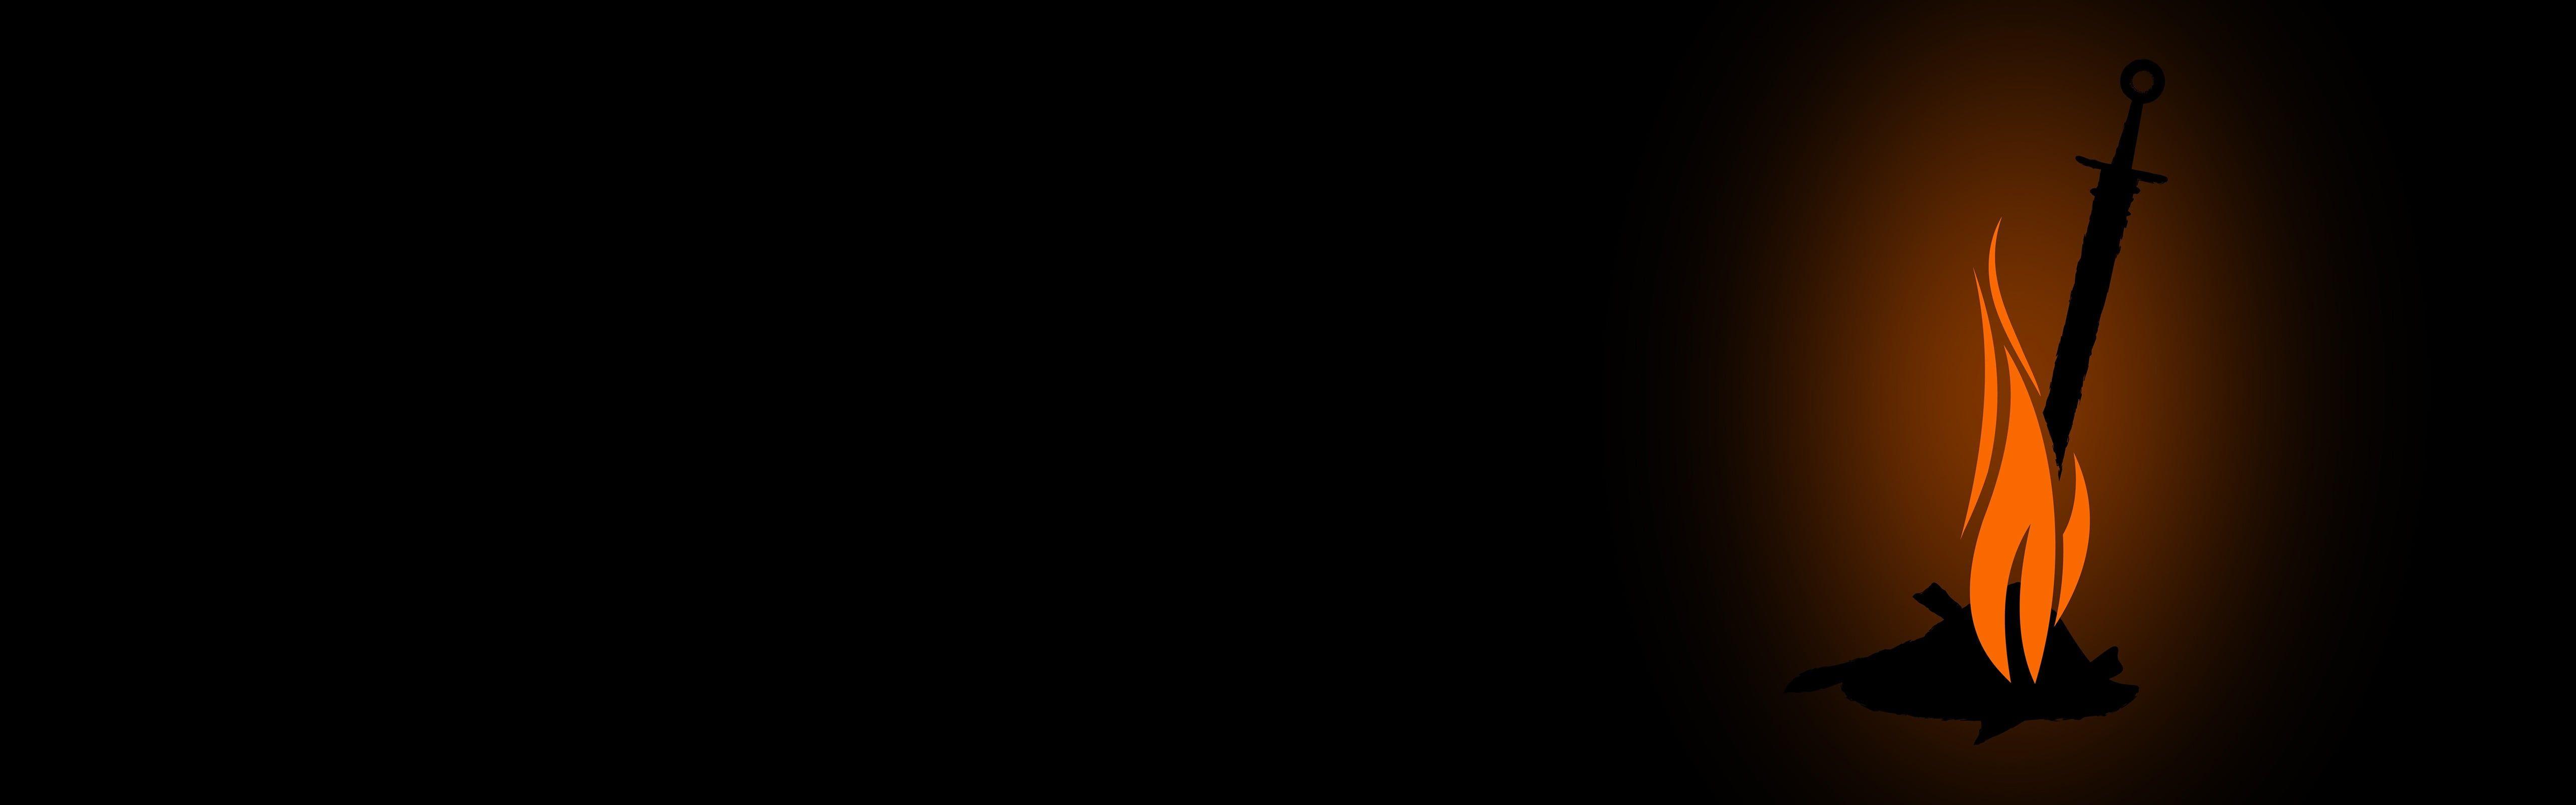 Sword On Fire Artwork Dark Souls Video Games Fire Sword Simple Background Minimalism Dual Monitors Multiple Displ Simple Backgrounds Hd Wallpaper Background Dark souls dual monitor wallpaper